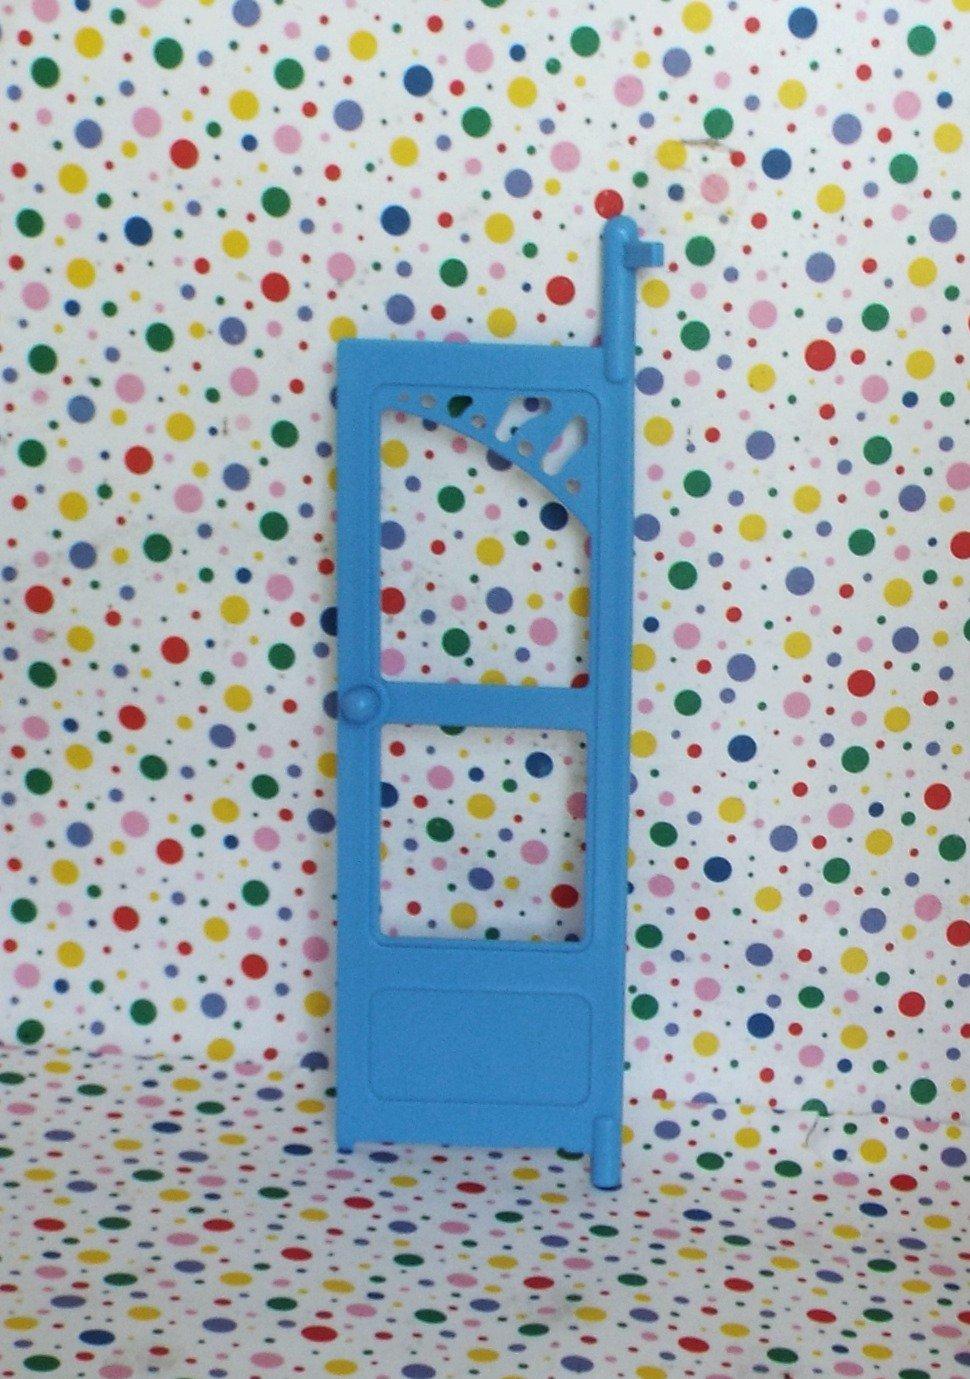 Fisher Price Loving Family Dream Dollhouse Blue Door Part 6364